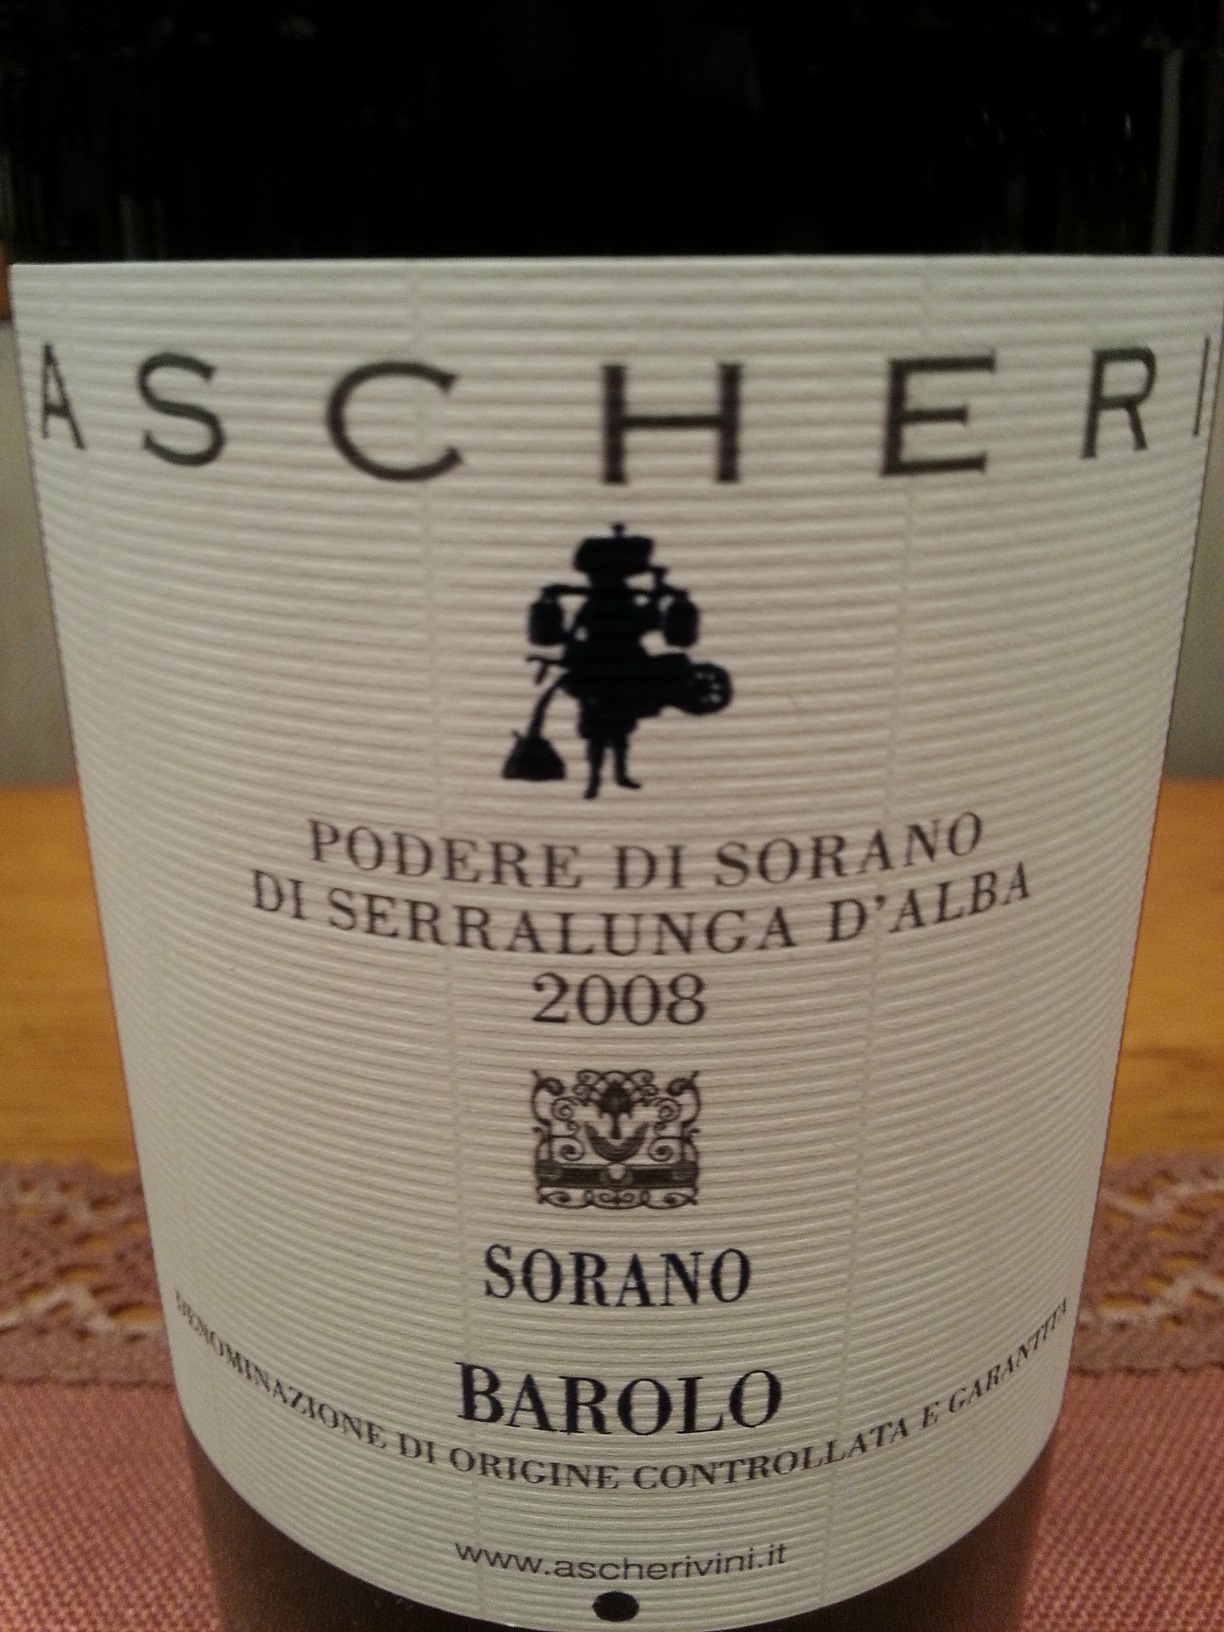 2008 Barolo Sorano | Ascheri